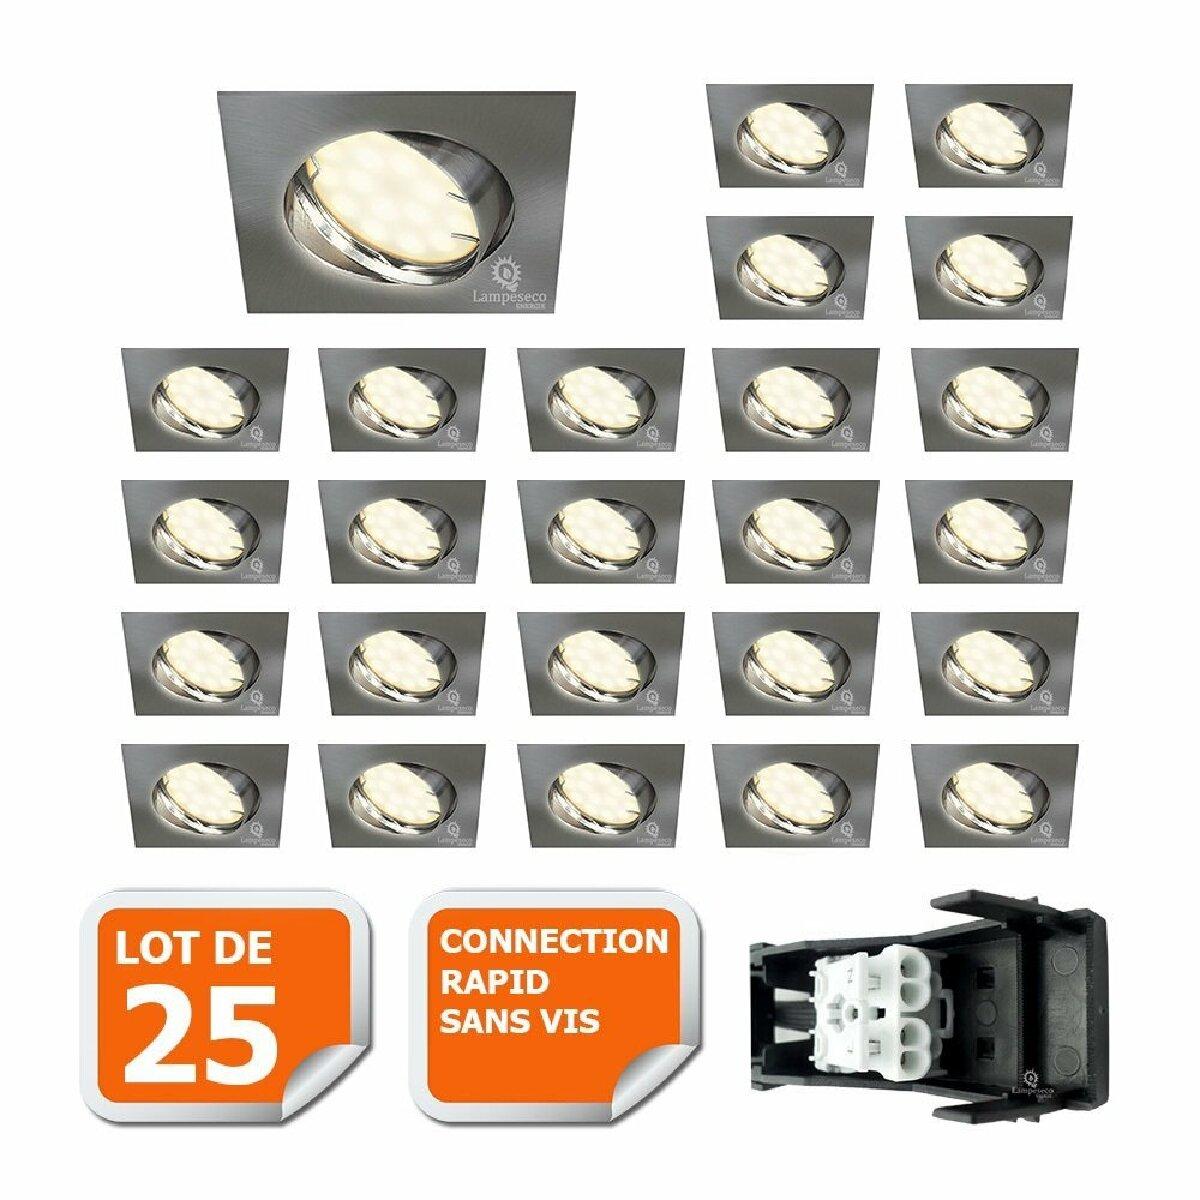 Lampesecoenergie LOT DE 25 SPOT ENCASTRABLE ORIENTABLE LED CARRE ALU BROSSE GU10 230V eq. 50W BLANC NEUTRE